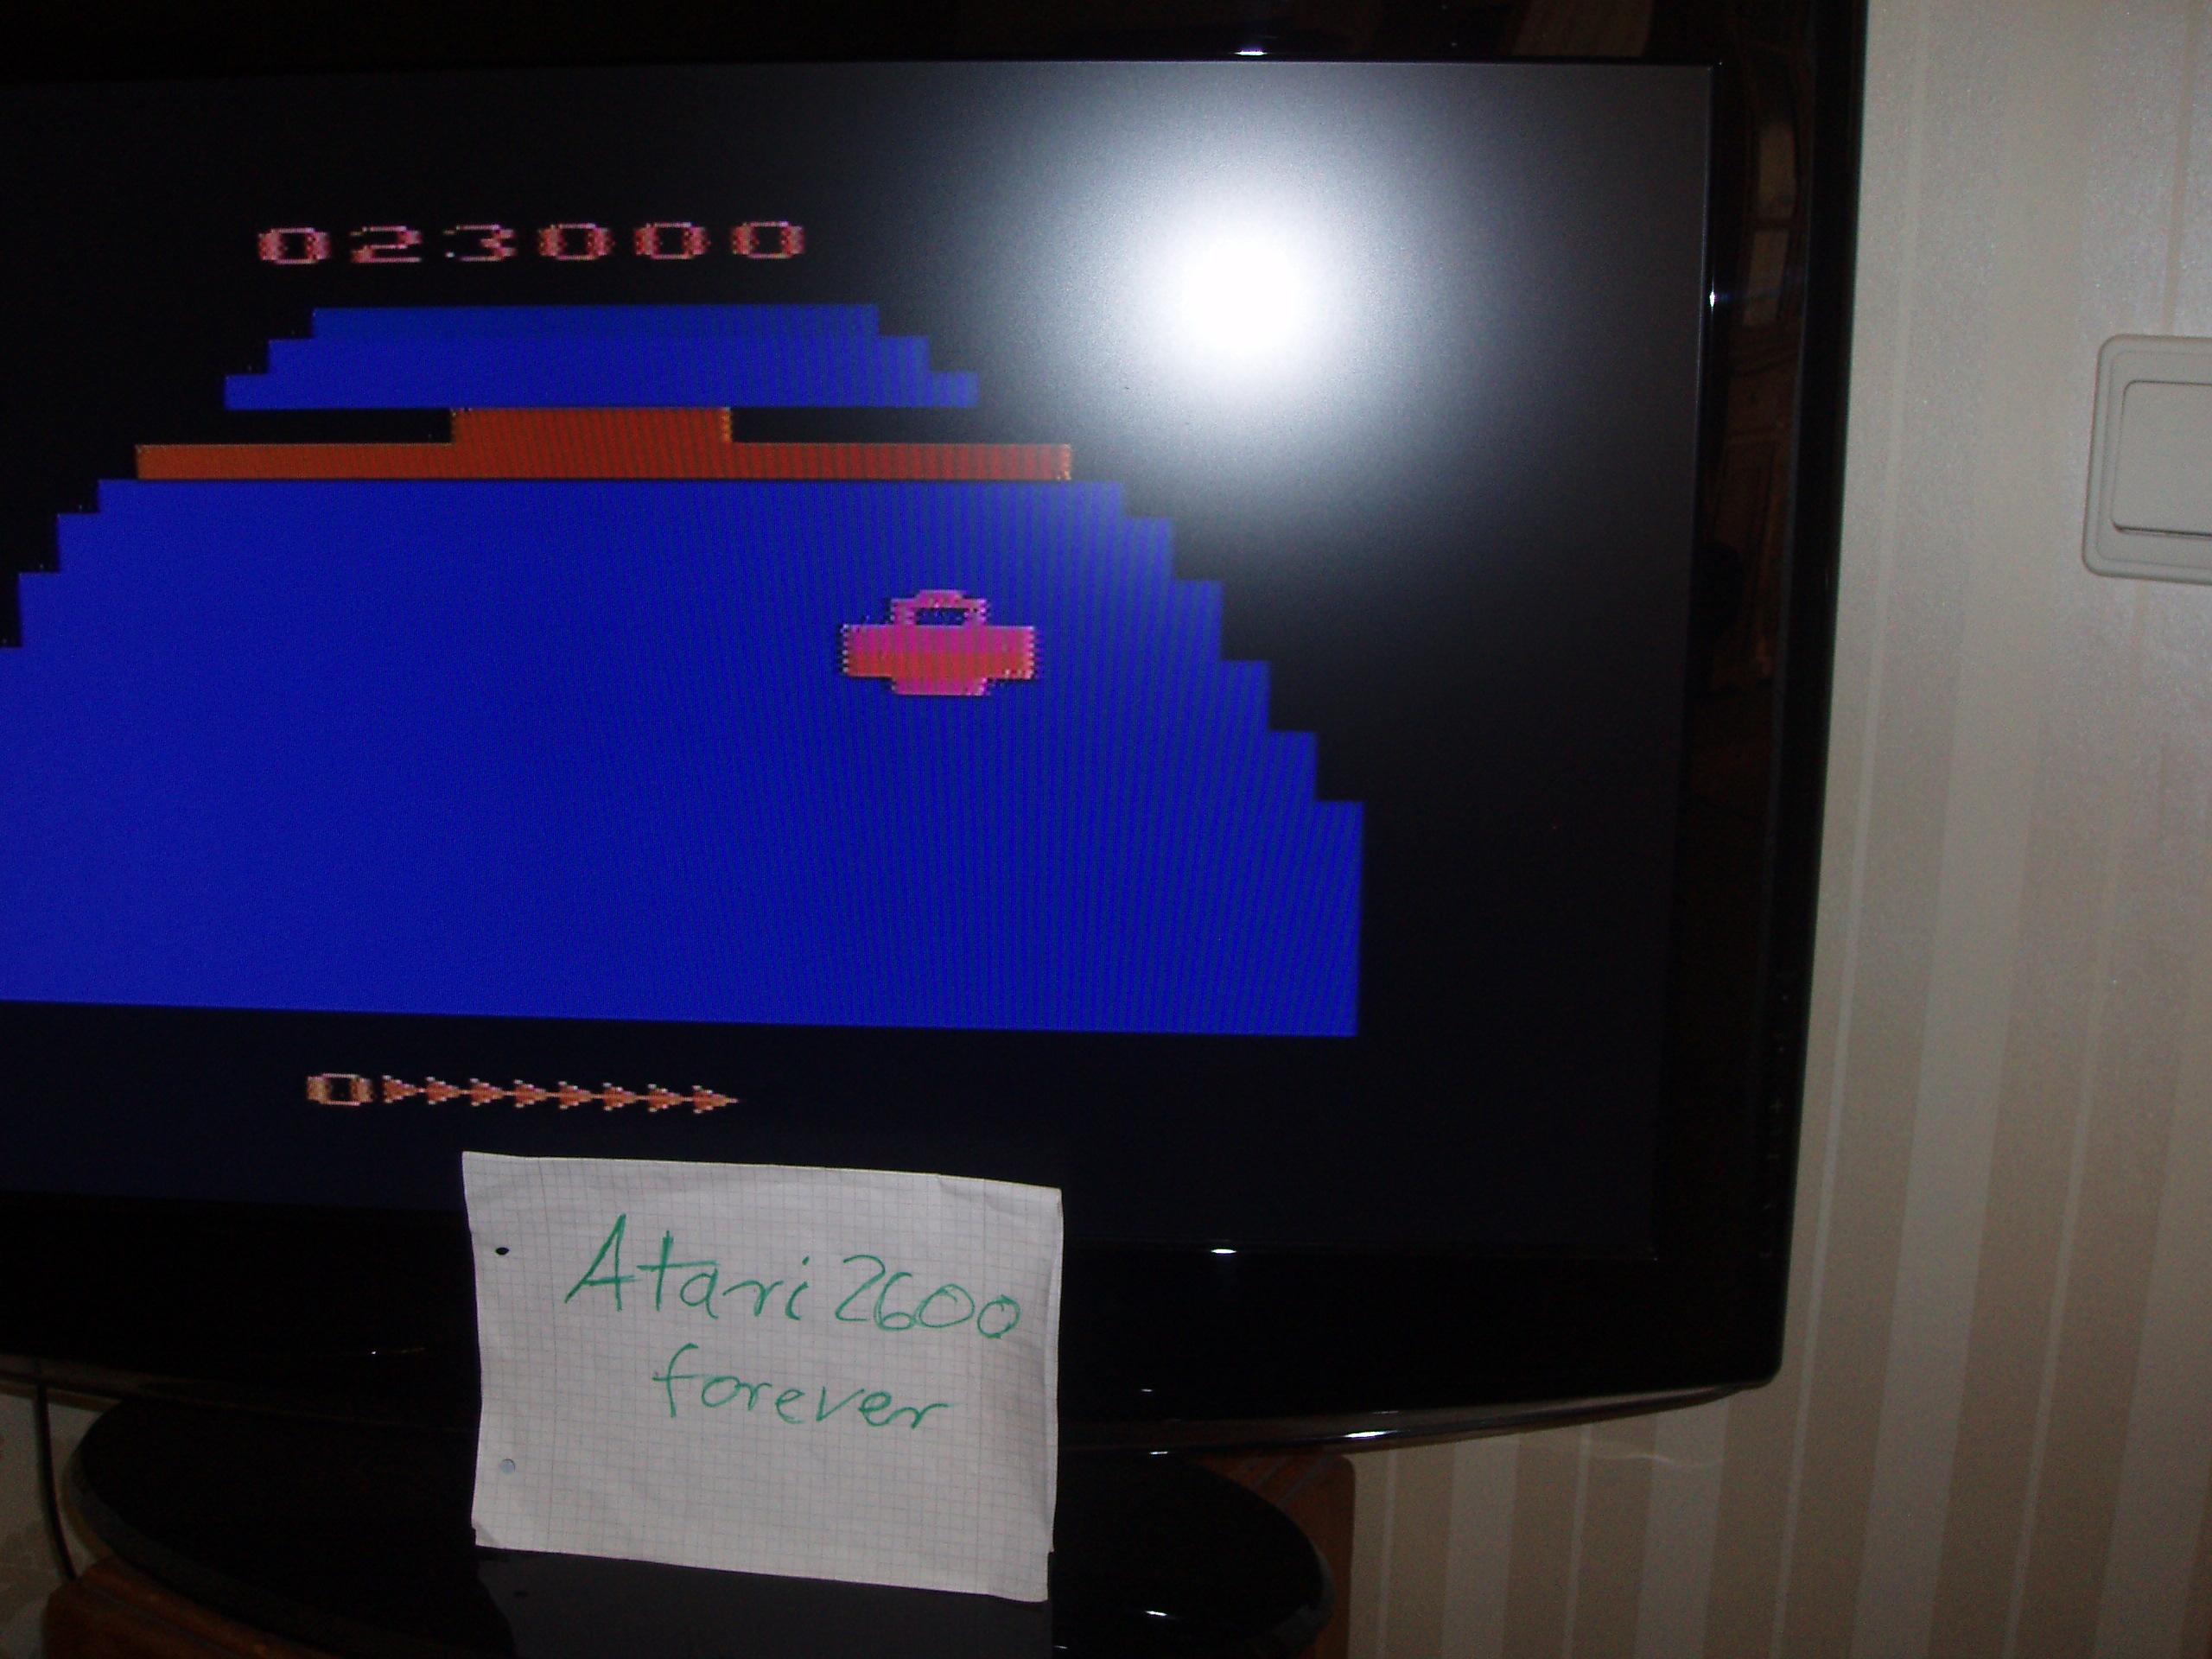 atari2600forever: Zaxxon (Atari 2600 Novice/B) 23,000 points on 2016-07-05 03:44:29